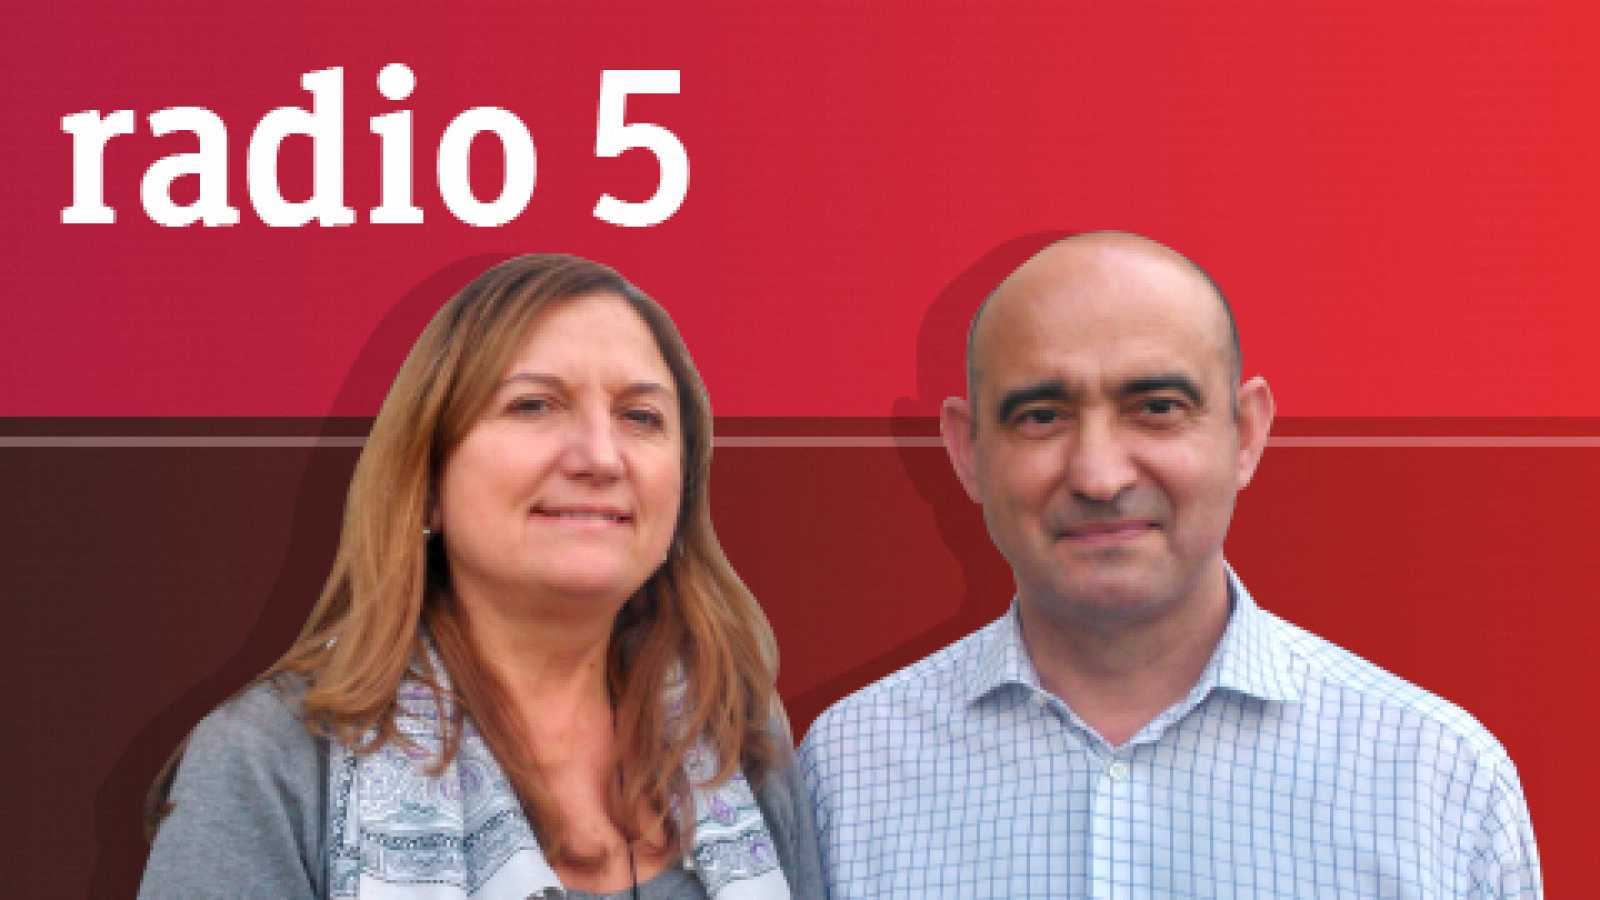 Descubriendo capacidades - Prevenir discapacidades en verano - 22/08/18 - escuchar ahora